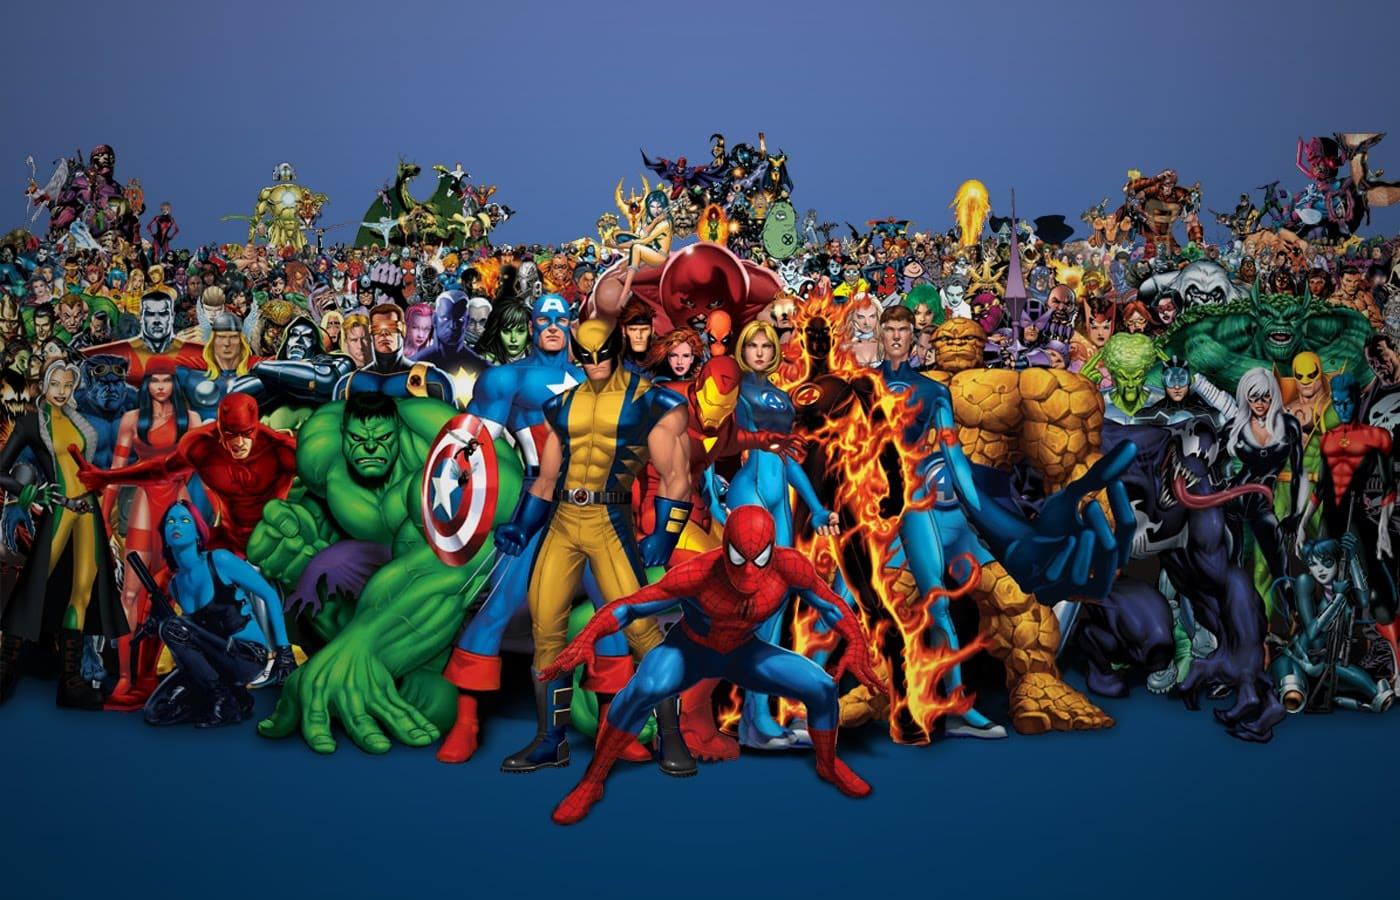 Best Wallpaper Marvel Halloween - Magnificent-Marvel-Wallpaper  Gallery_338411.jpg